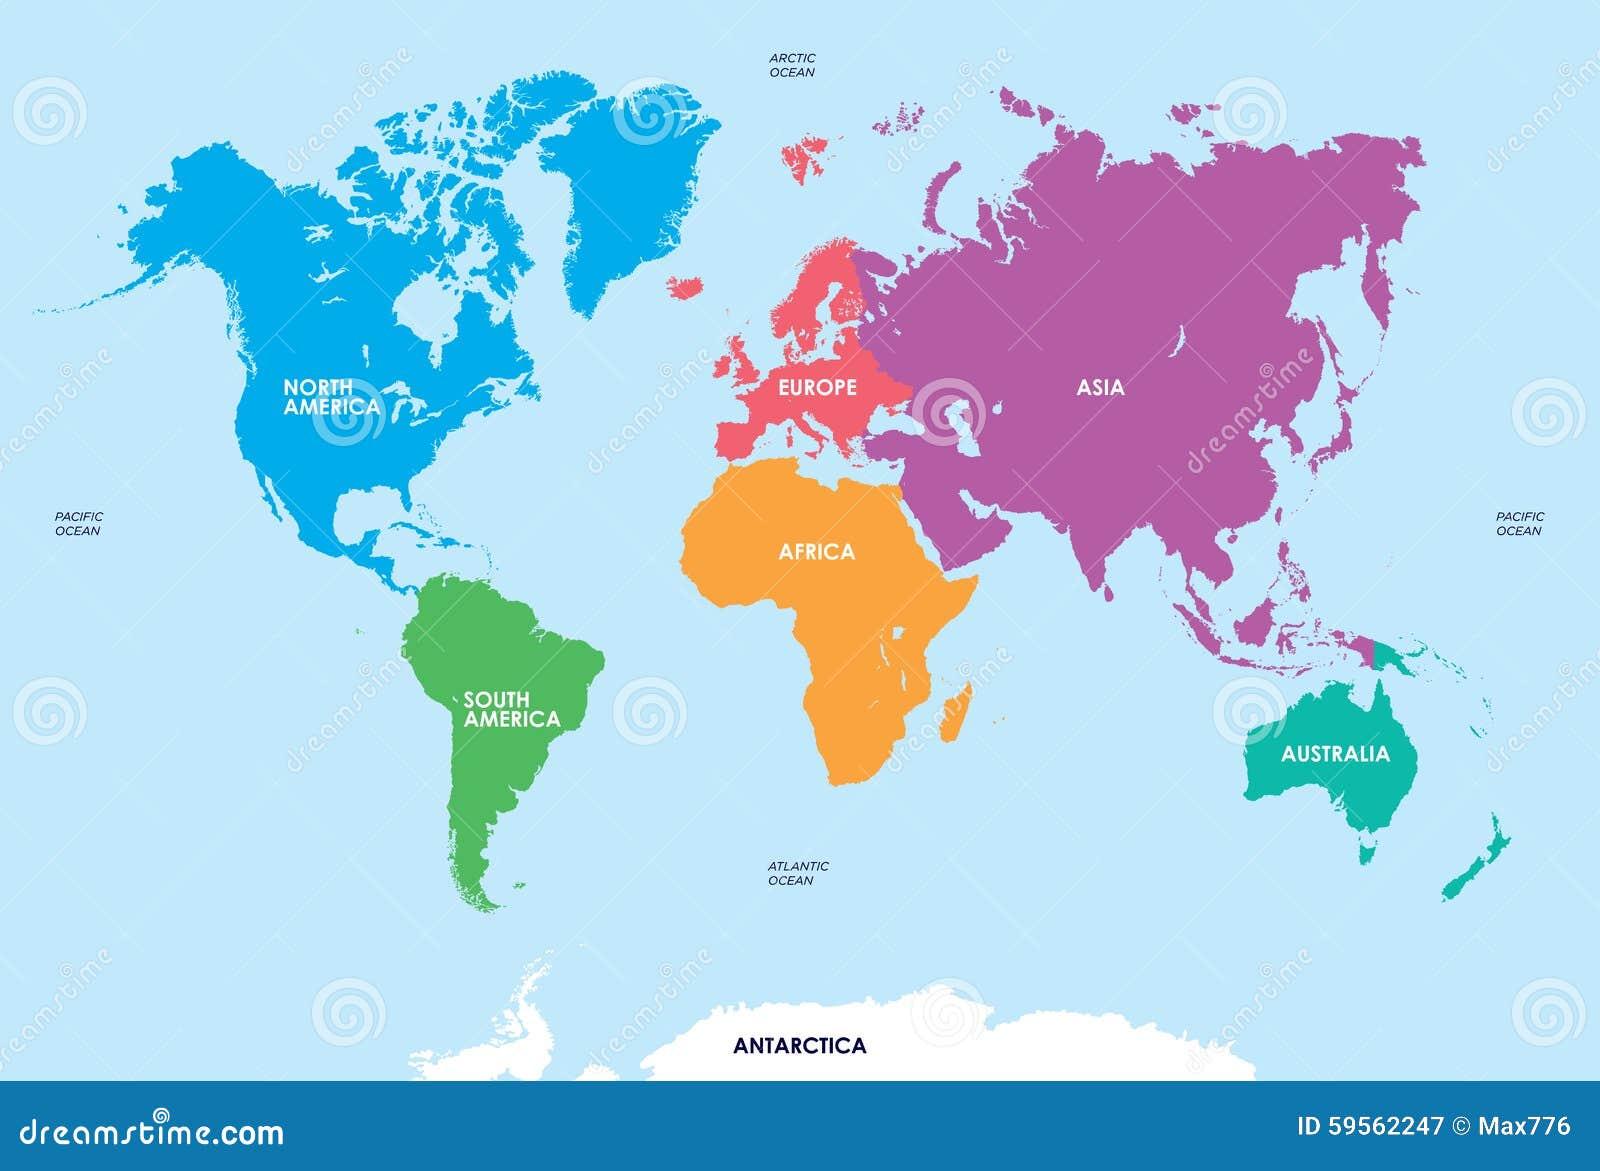 Karte Kontinente Welt.Kontinente Der Welt Karte Vektor Abbildung Illustration